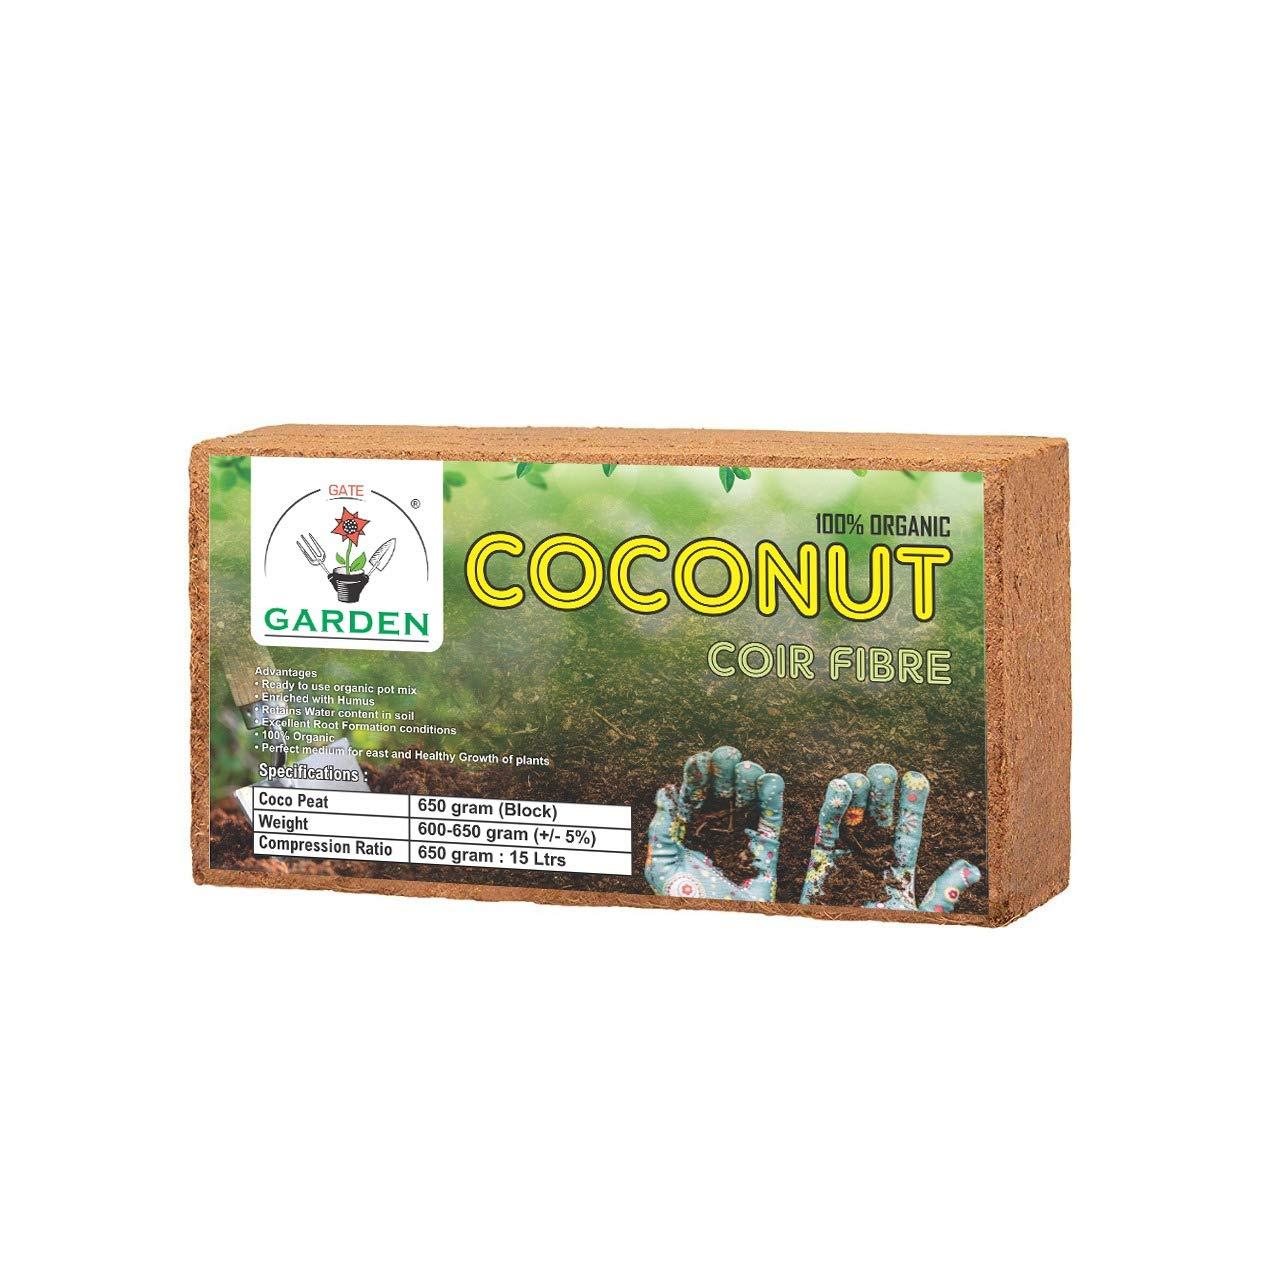 Gate garden coco peat block: